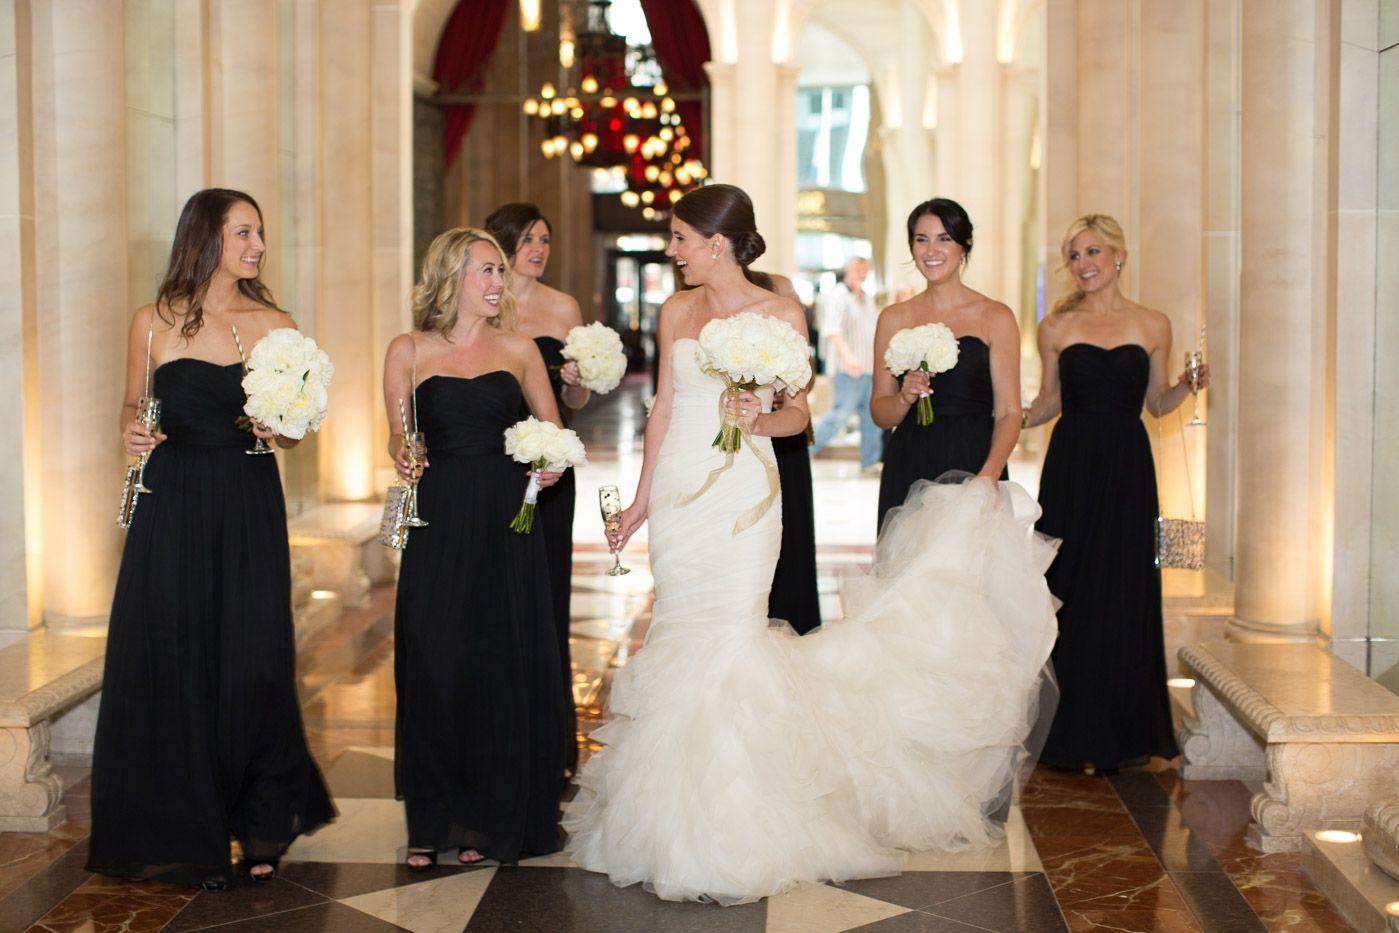 bridal party entrance | bridesmaids dress ideas | wedding dress